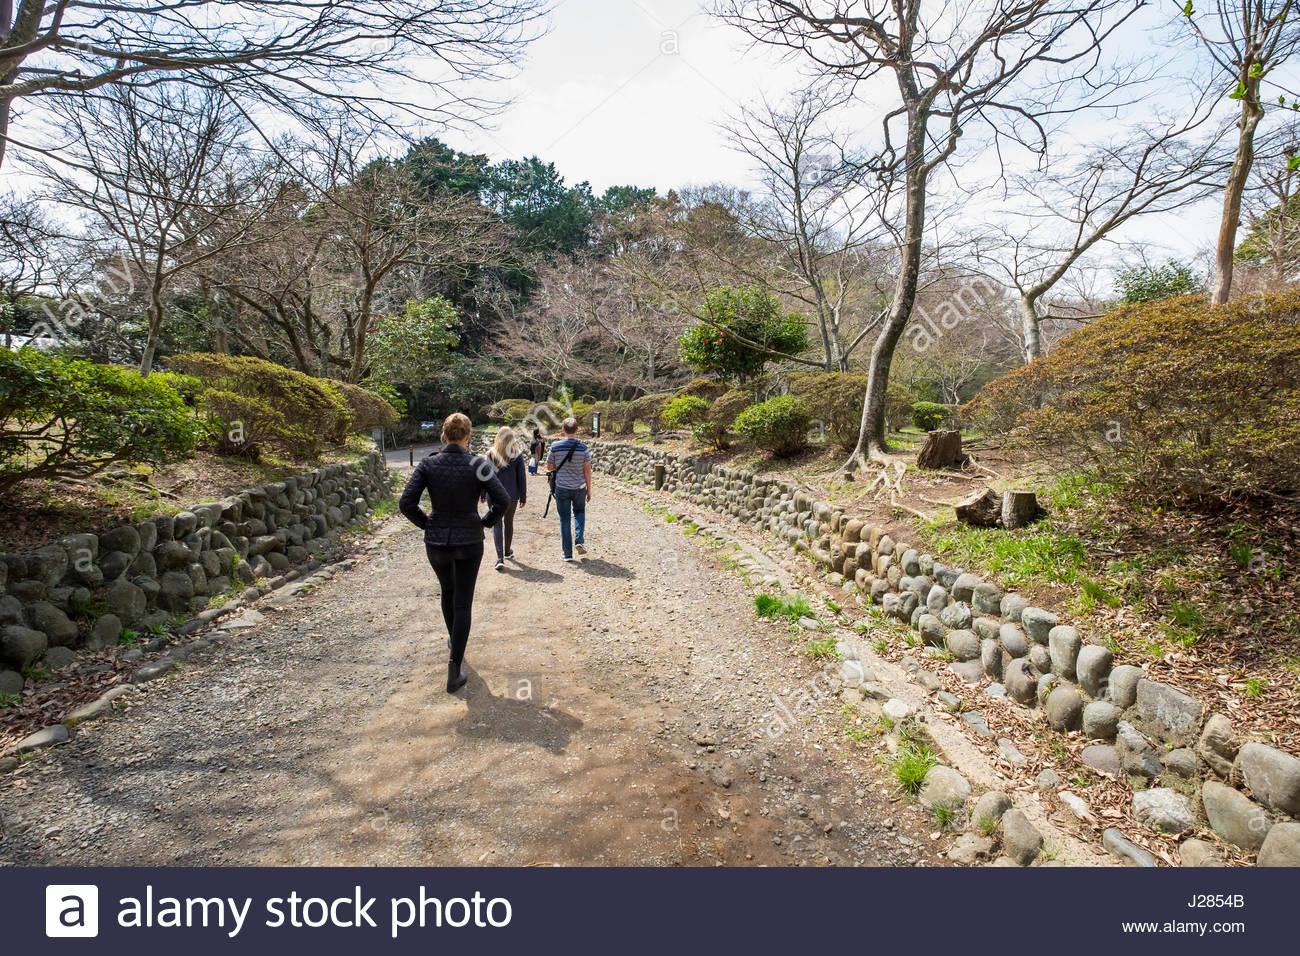 People walking through Genjiyama Park on the Kuzuharaoka-Daibutsu Hiking Course, Kamakura, Kanagawa Prefecture, - Stock Image